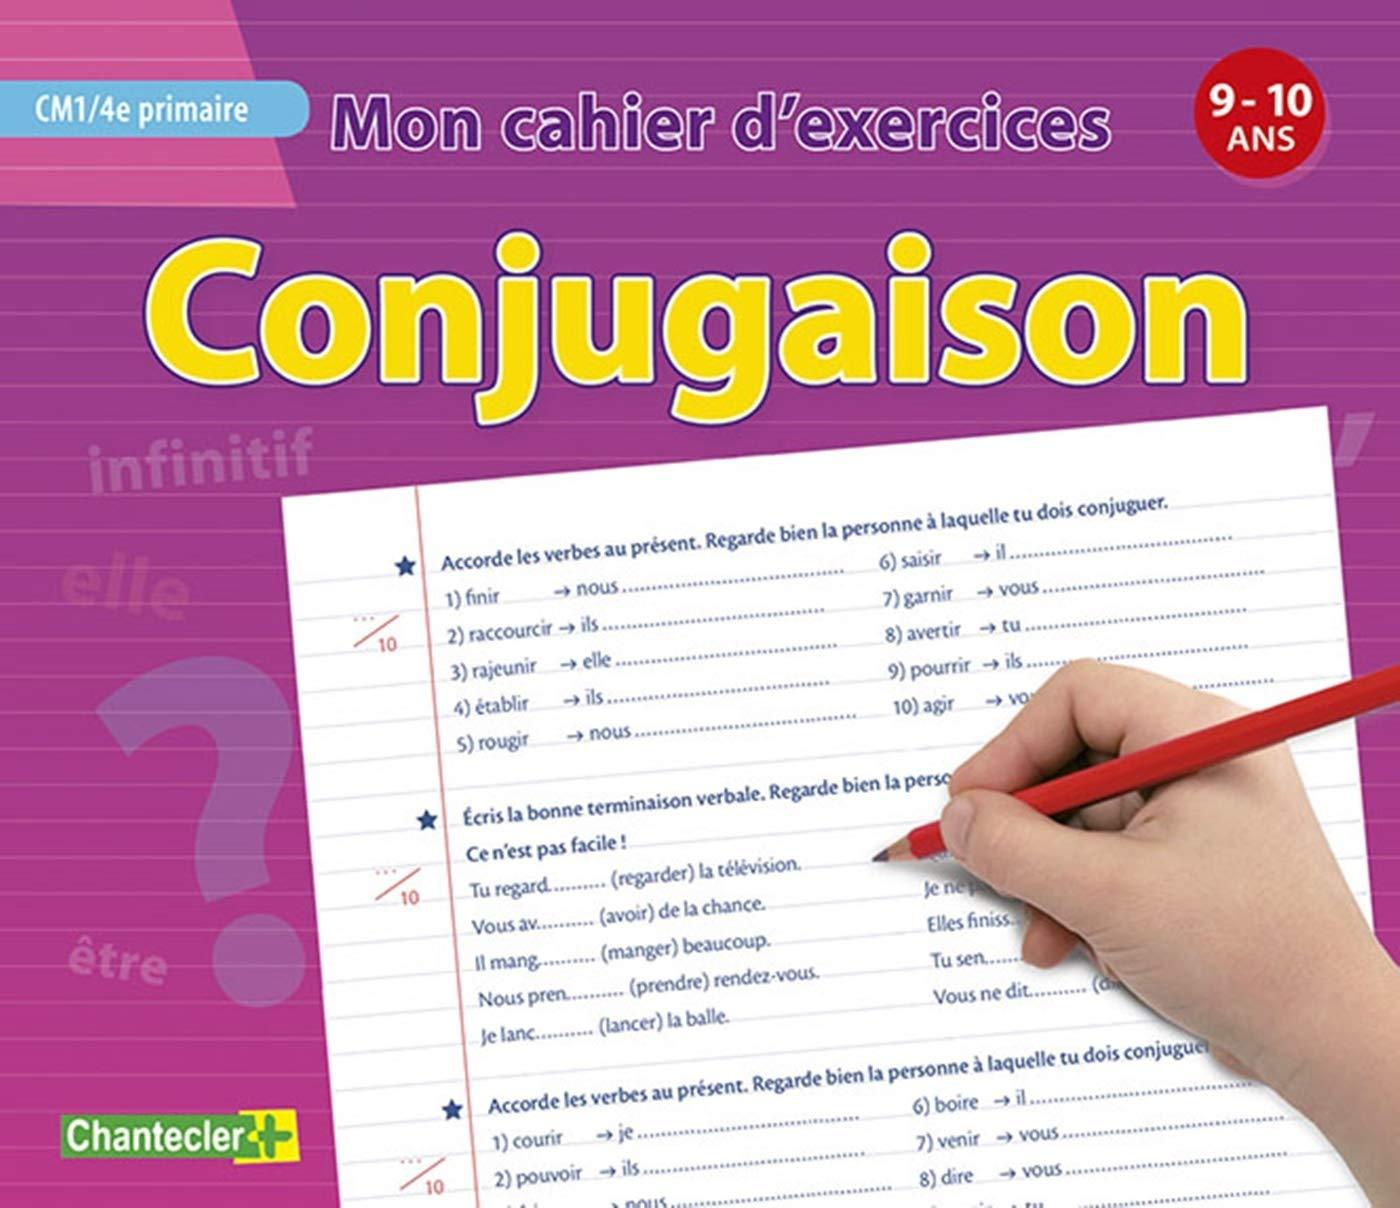 Mon Cahier D Exercices Conjugaison 9 10 A Cm1 4e Primaire Amazon Fr Collectif Livres